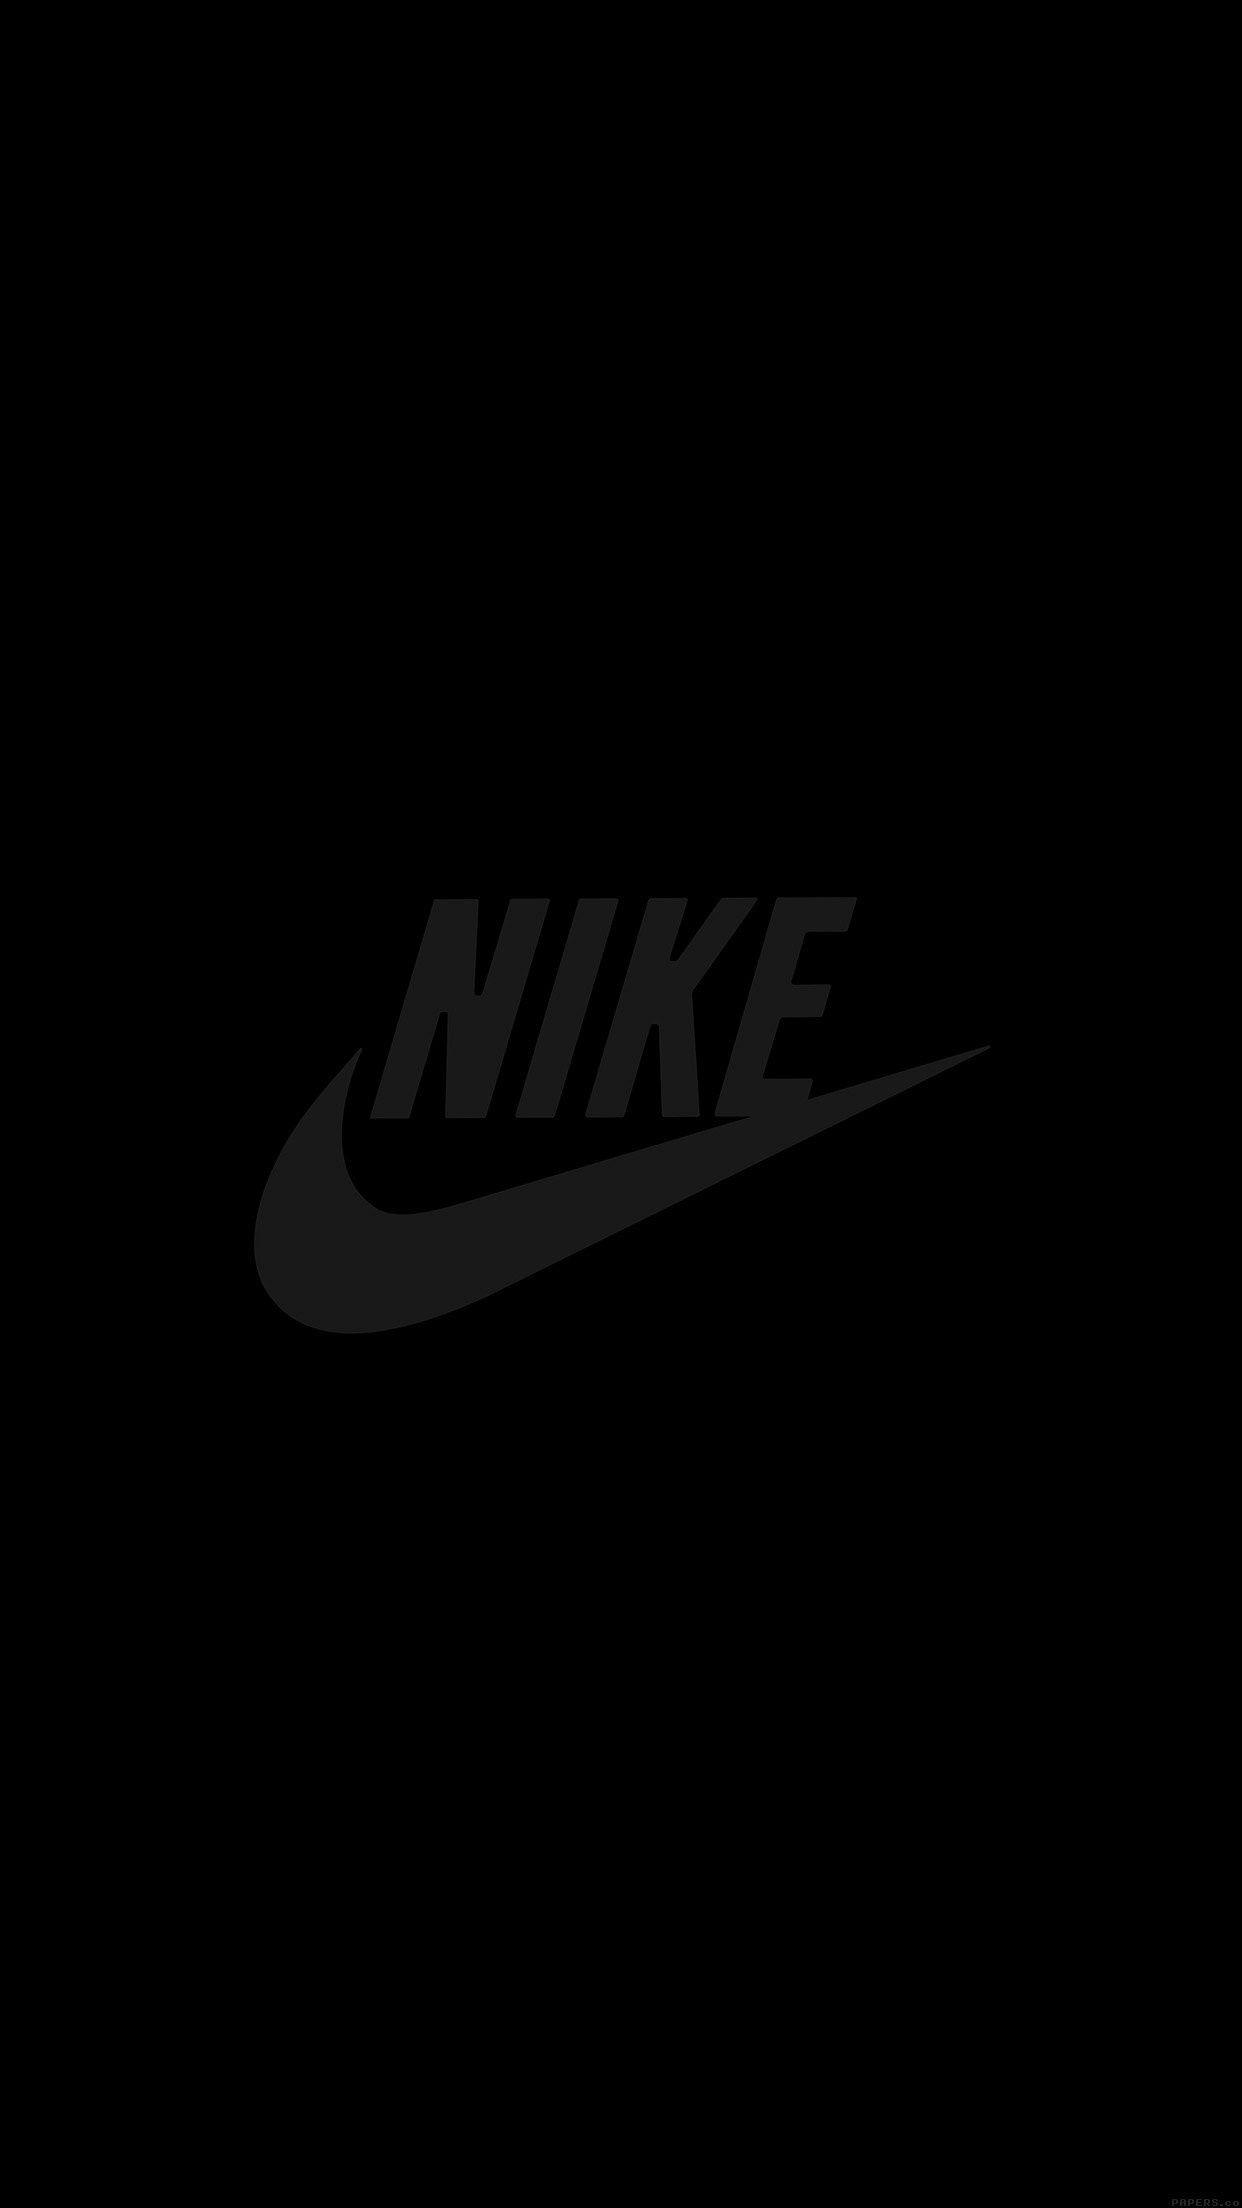 Nike Black iPhone Wallpapers on WallpaperDog 1242x2208